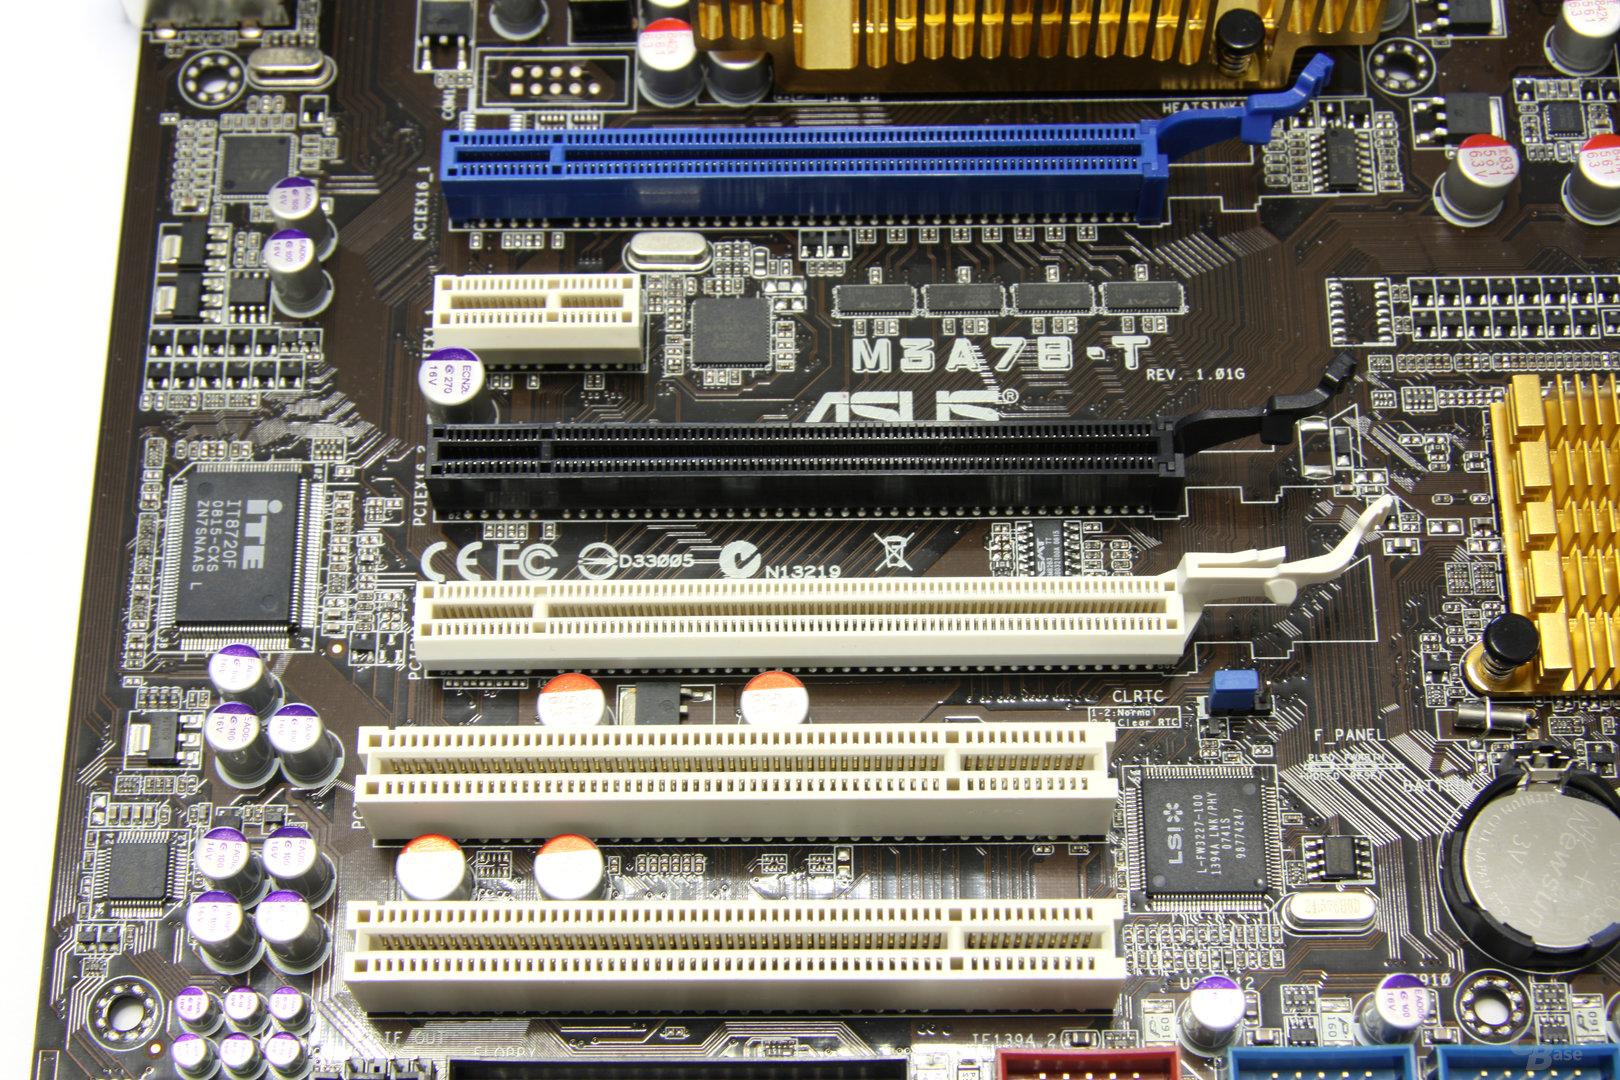 Asus M3A78-T PCIe-Slots